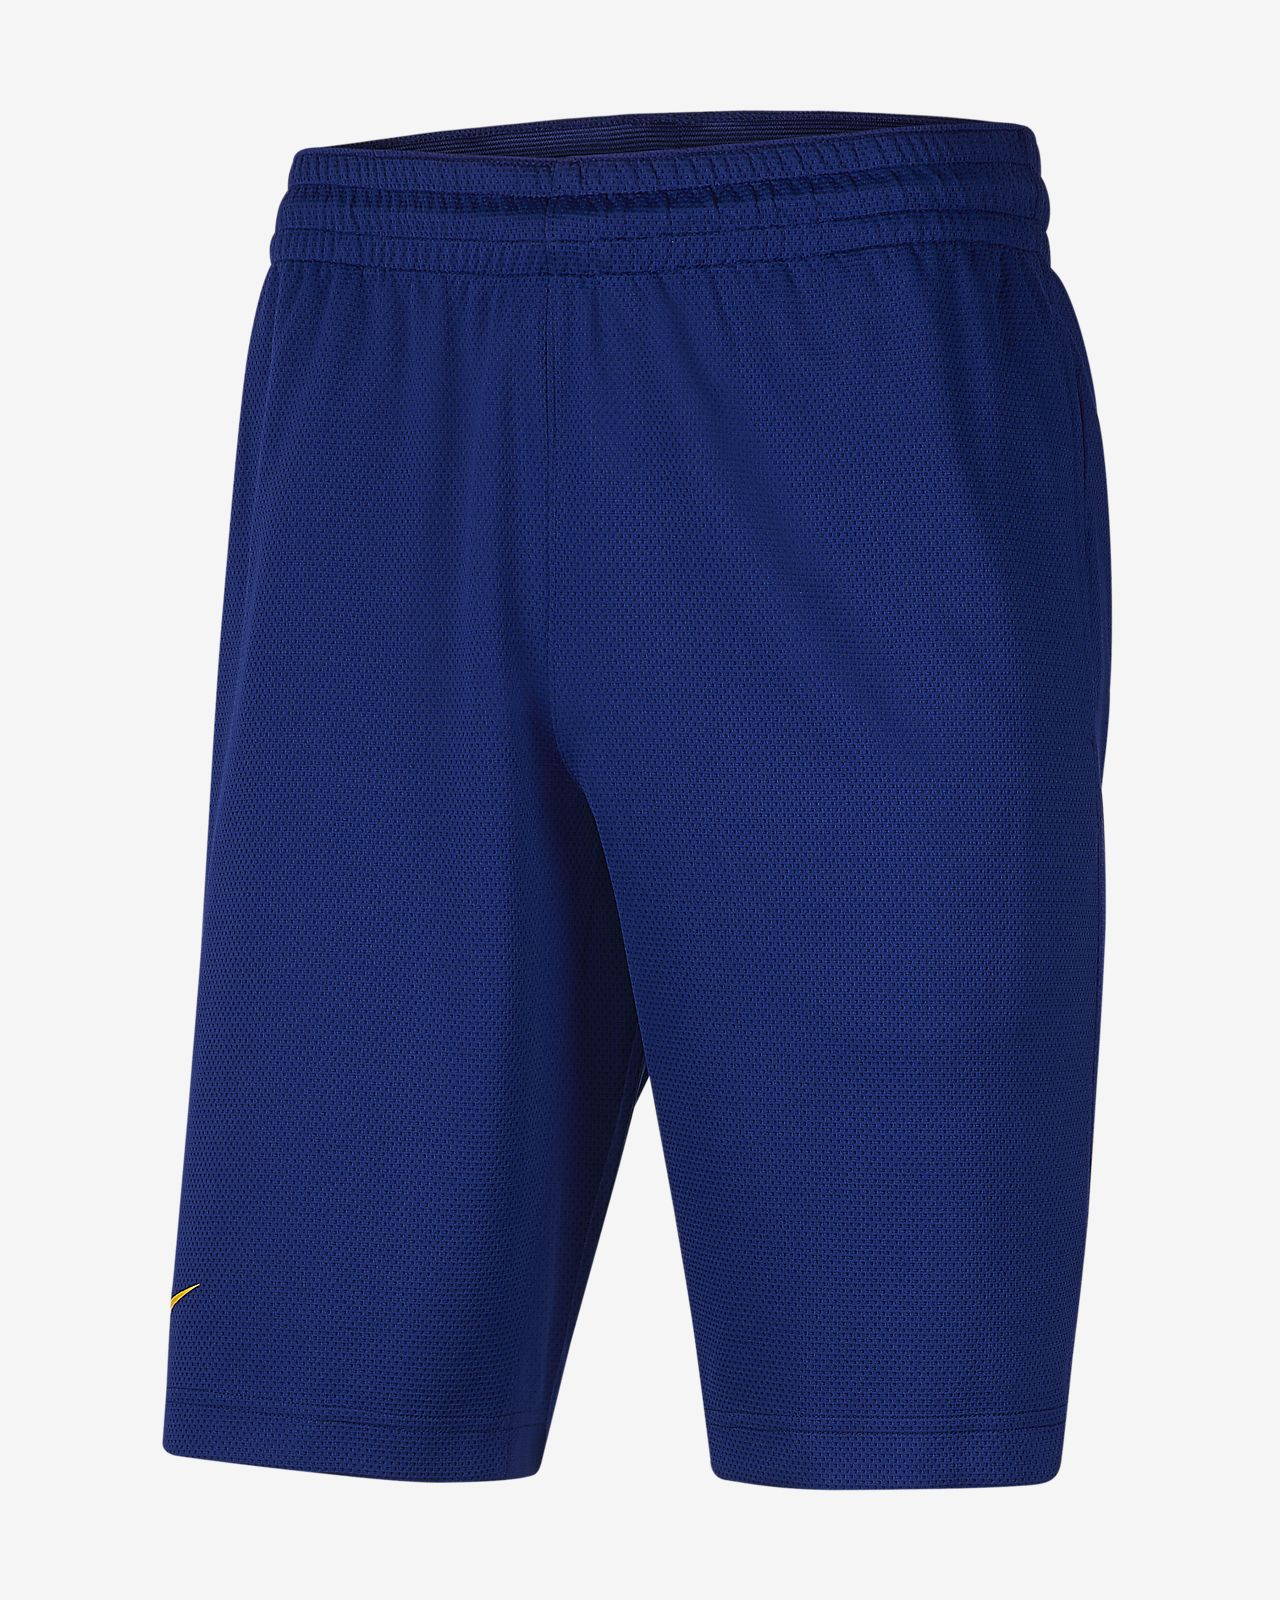 FC Barcelona Home Replica-Shorts für Herren